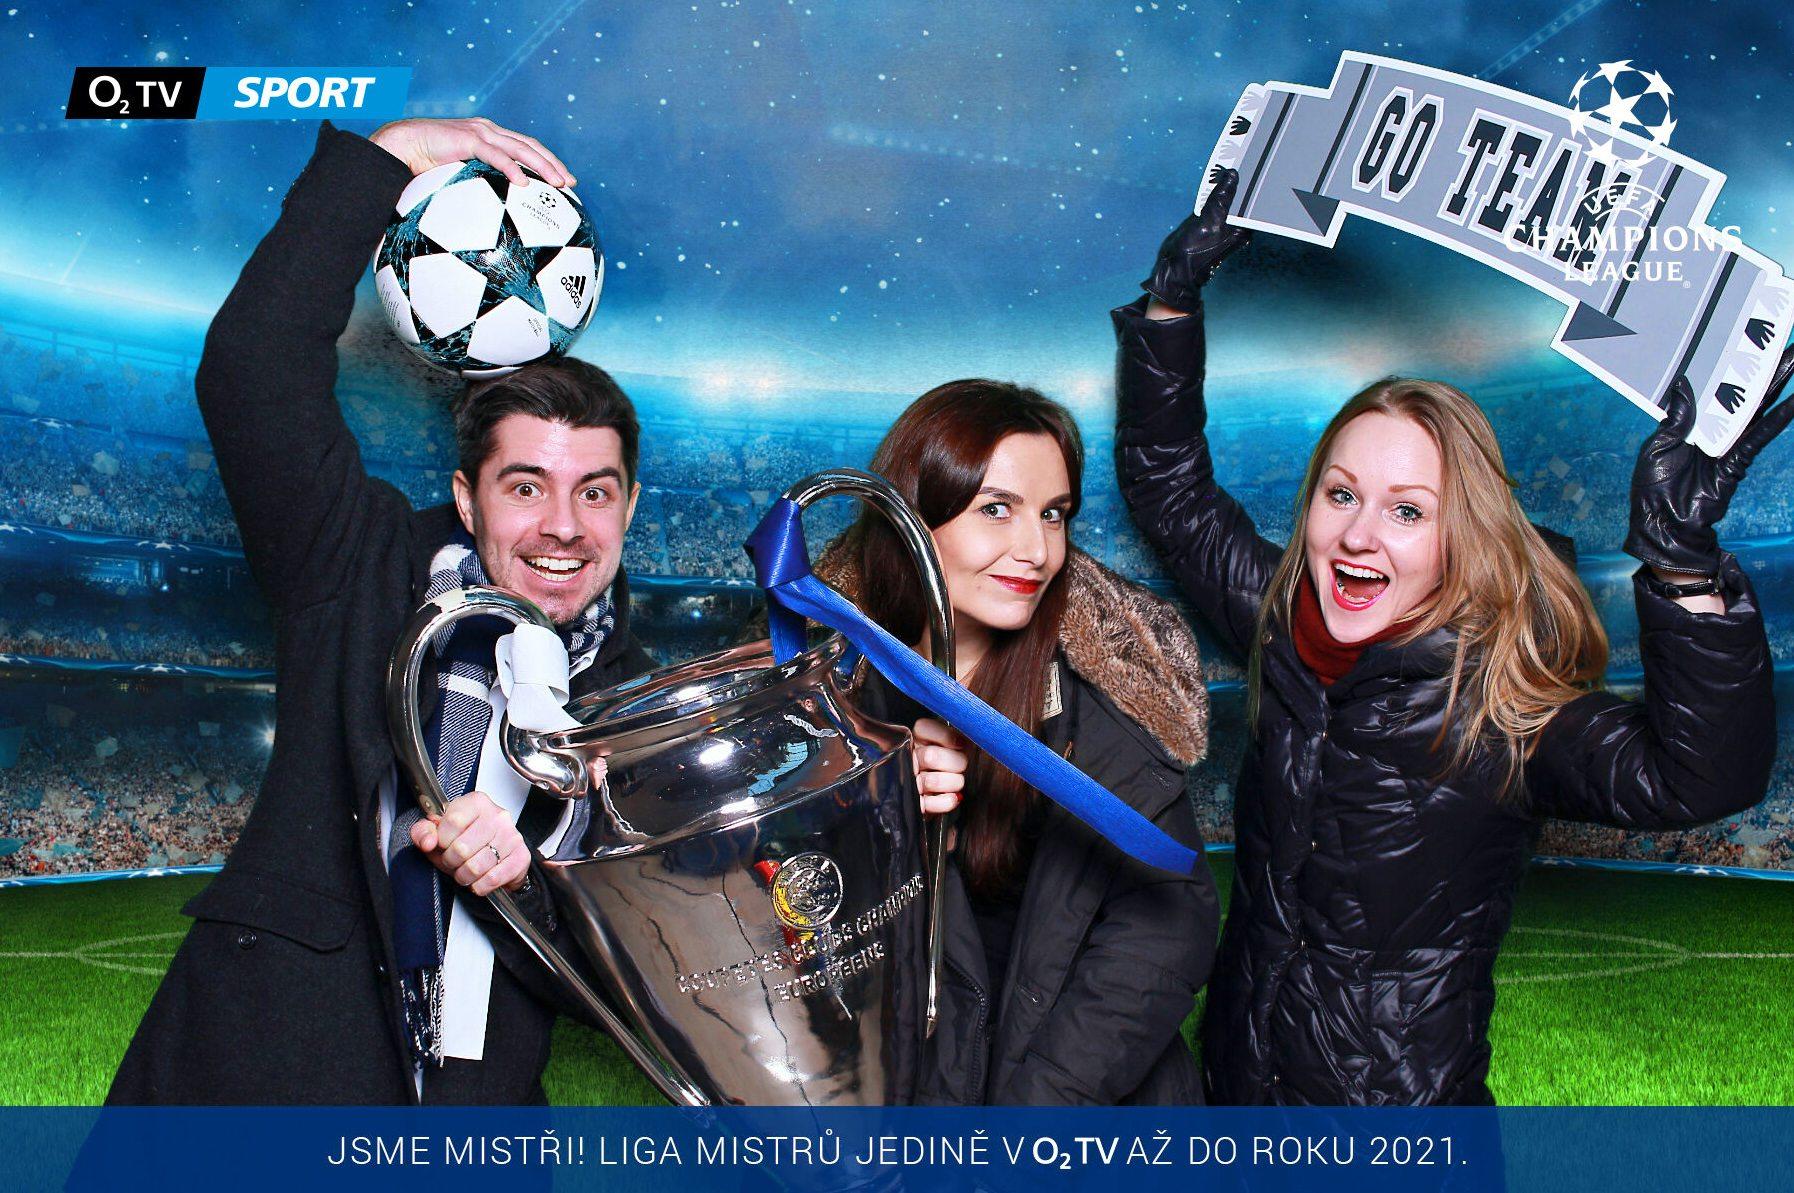 fotokoutek-o2tv-uefa-6-2-2018-387807